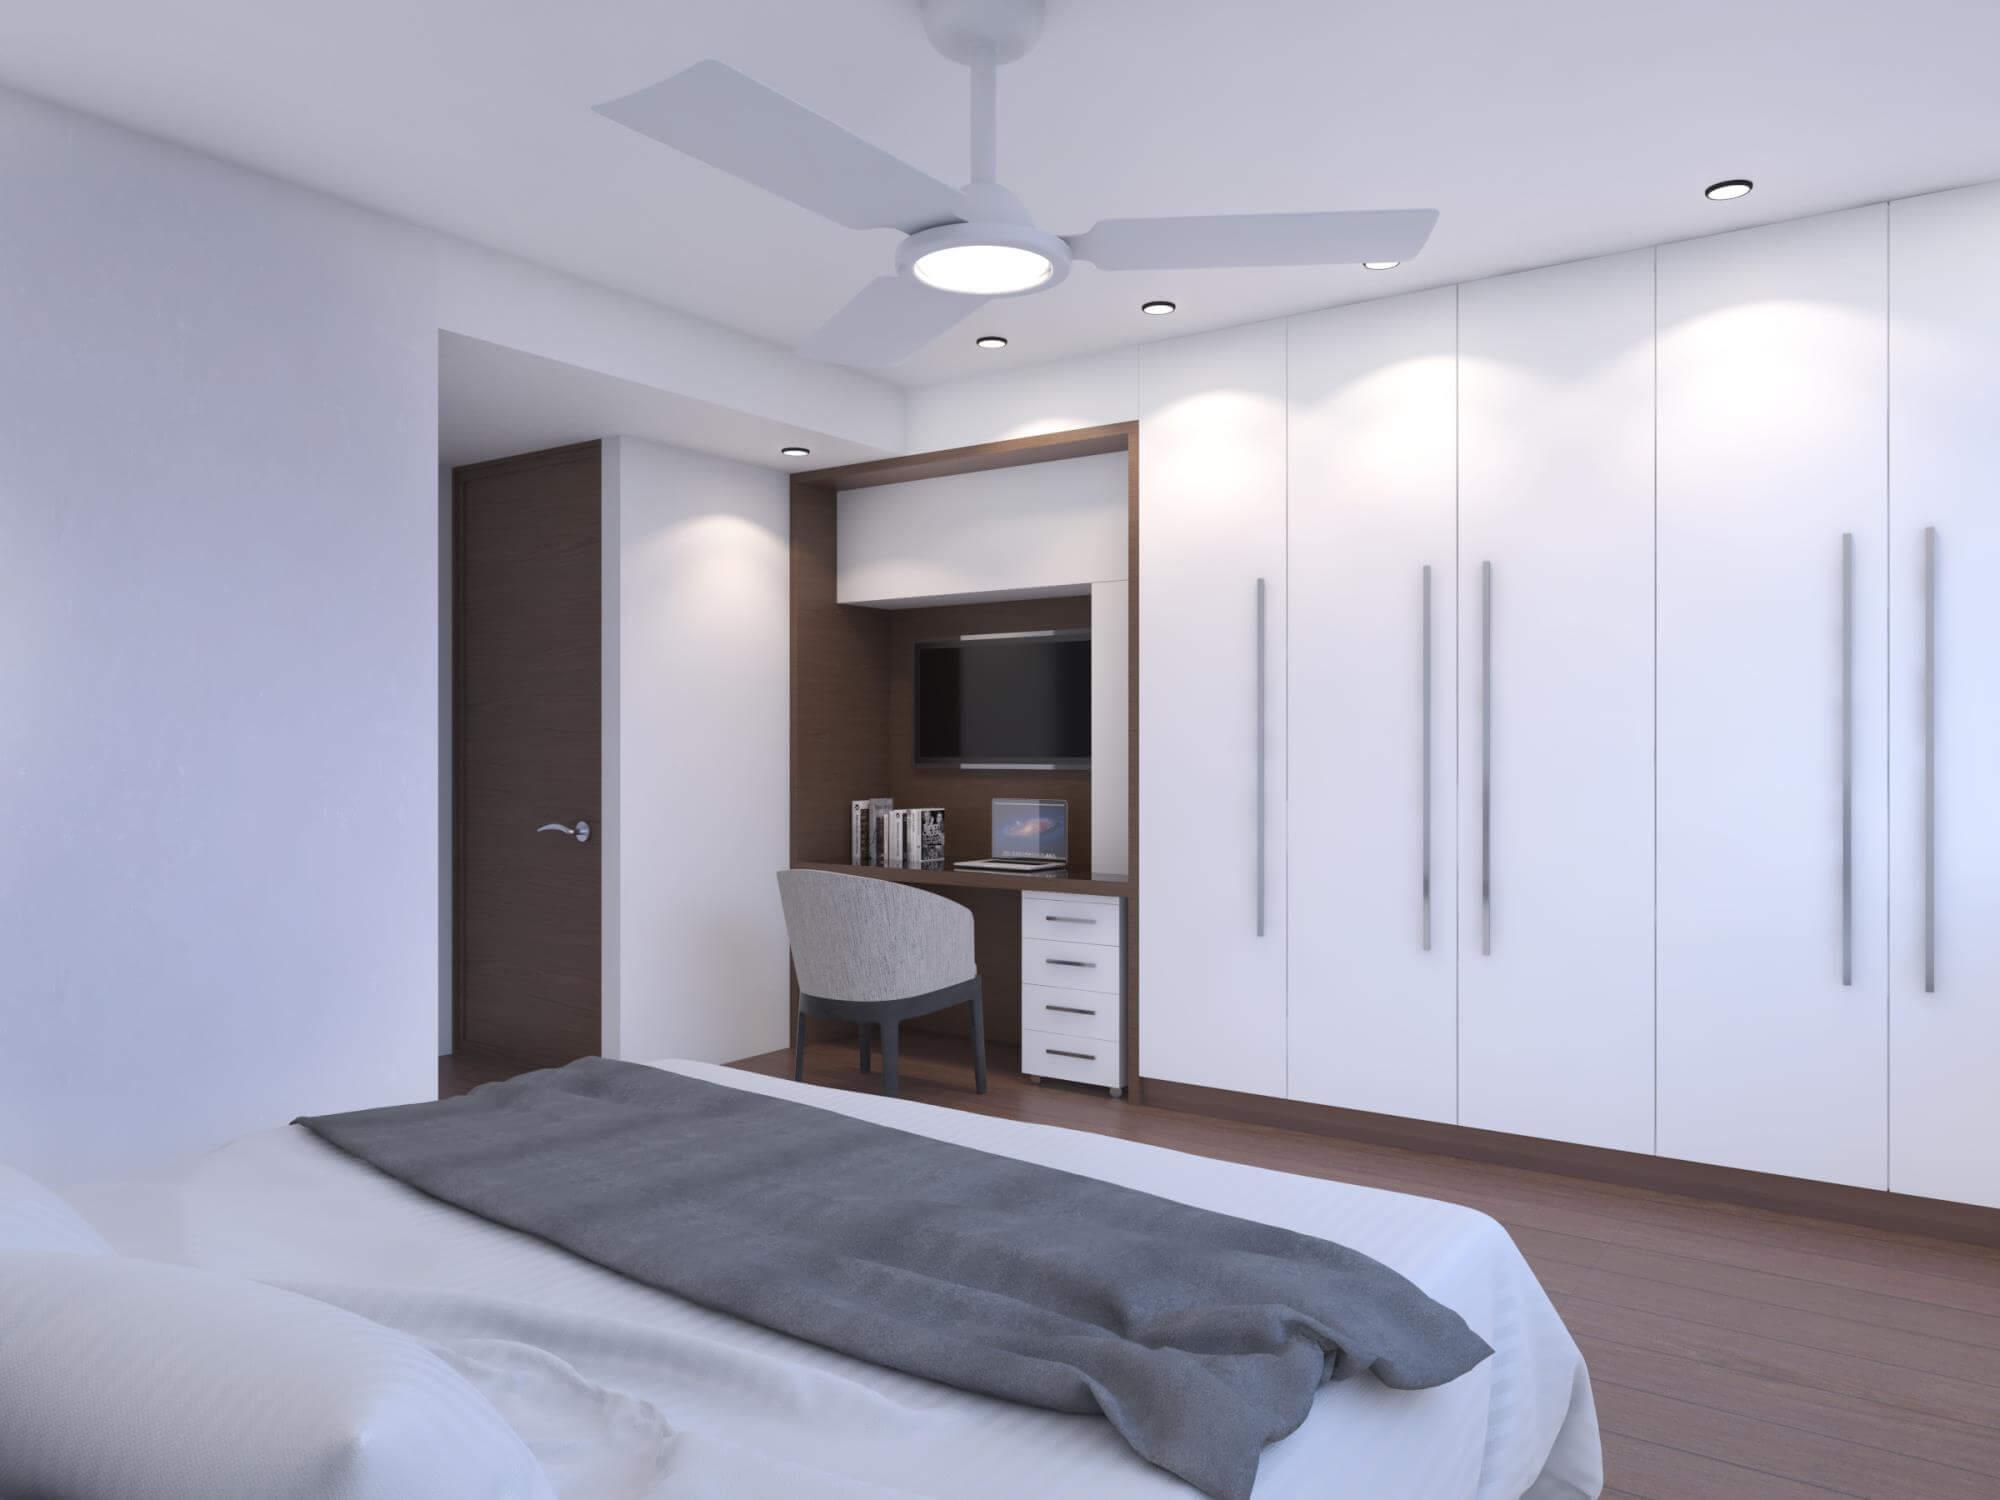 Bedroom with white walls, white cupboard, wooden desk and door.